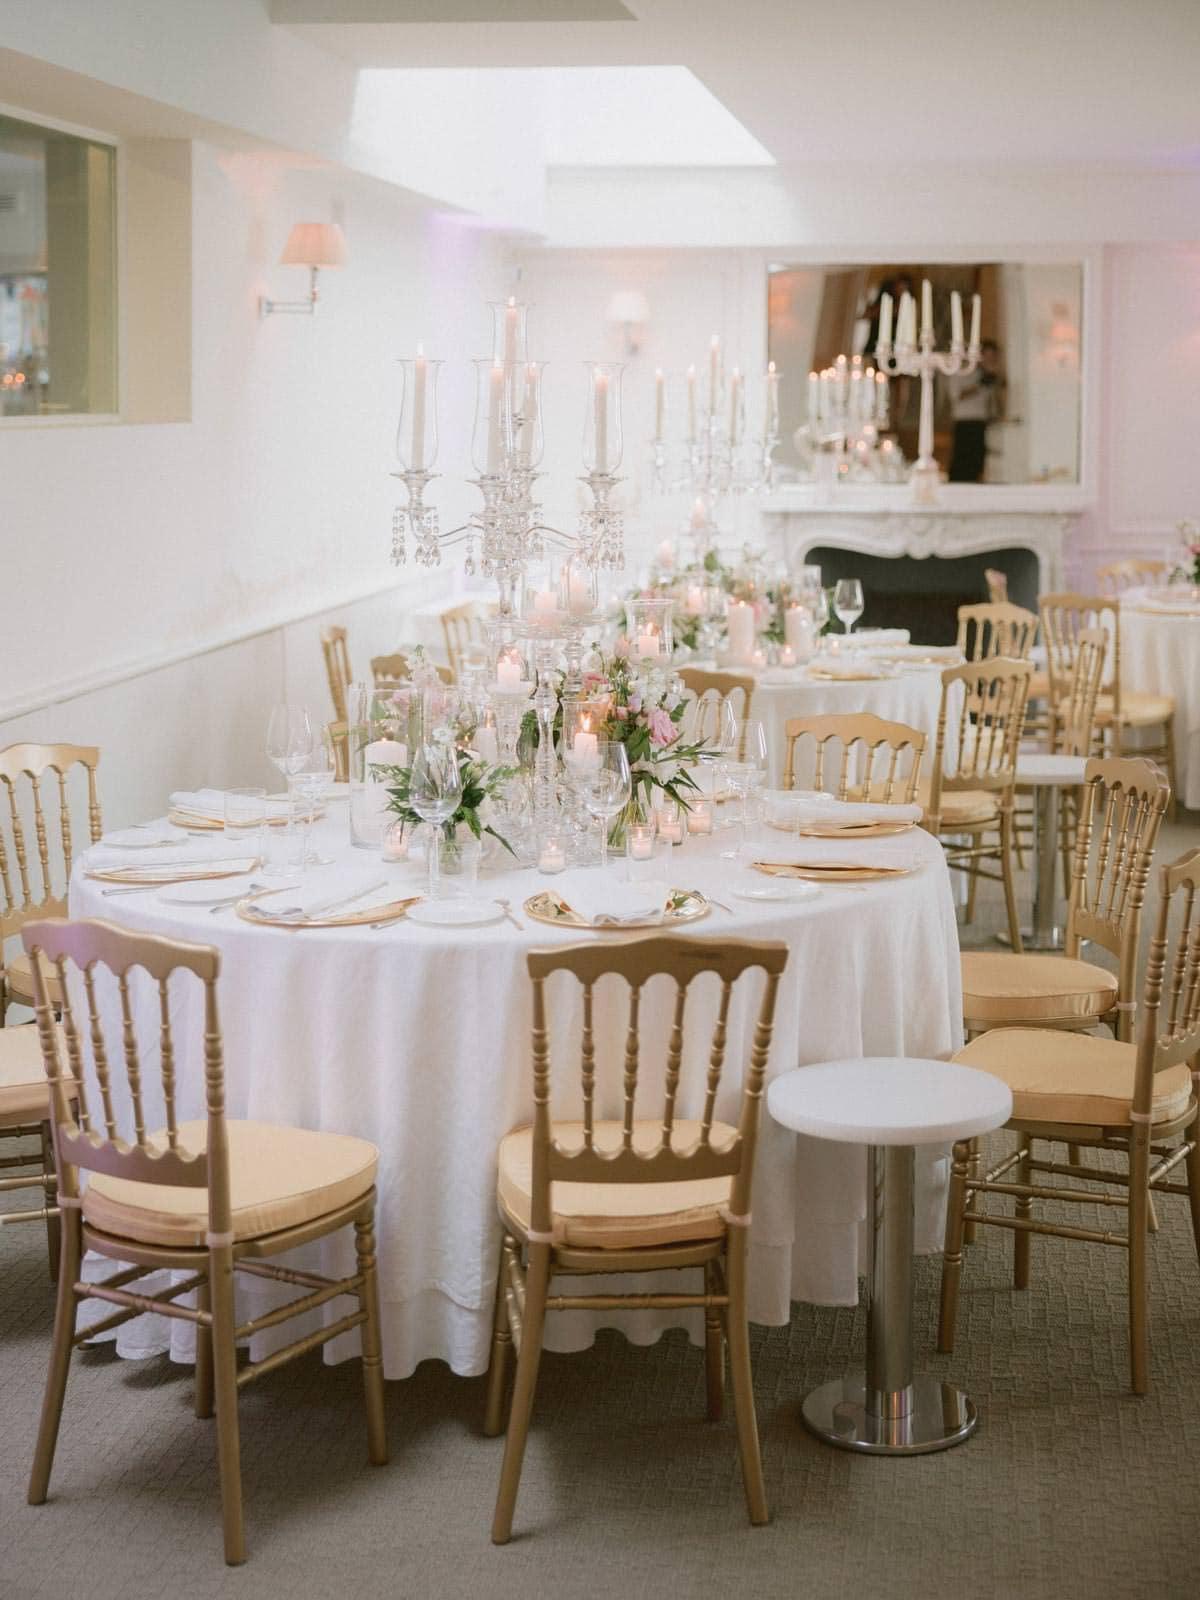 wedding dinner setting at La Speranzina in Bellagio